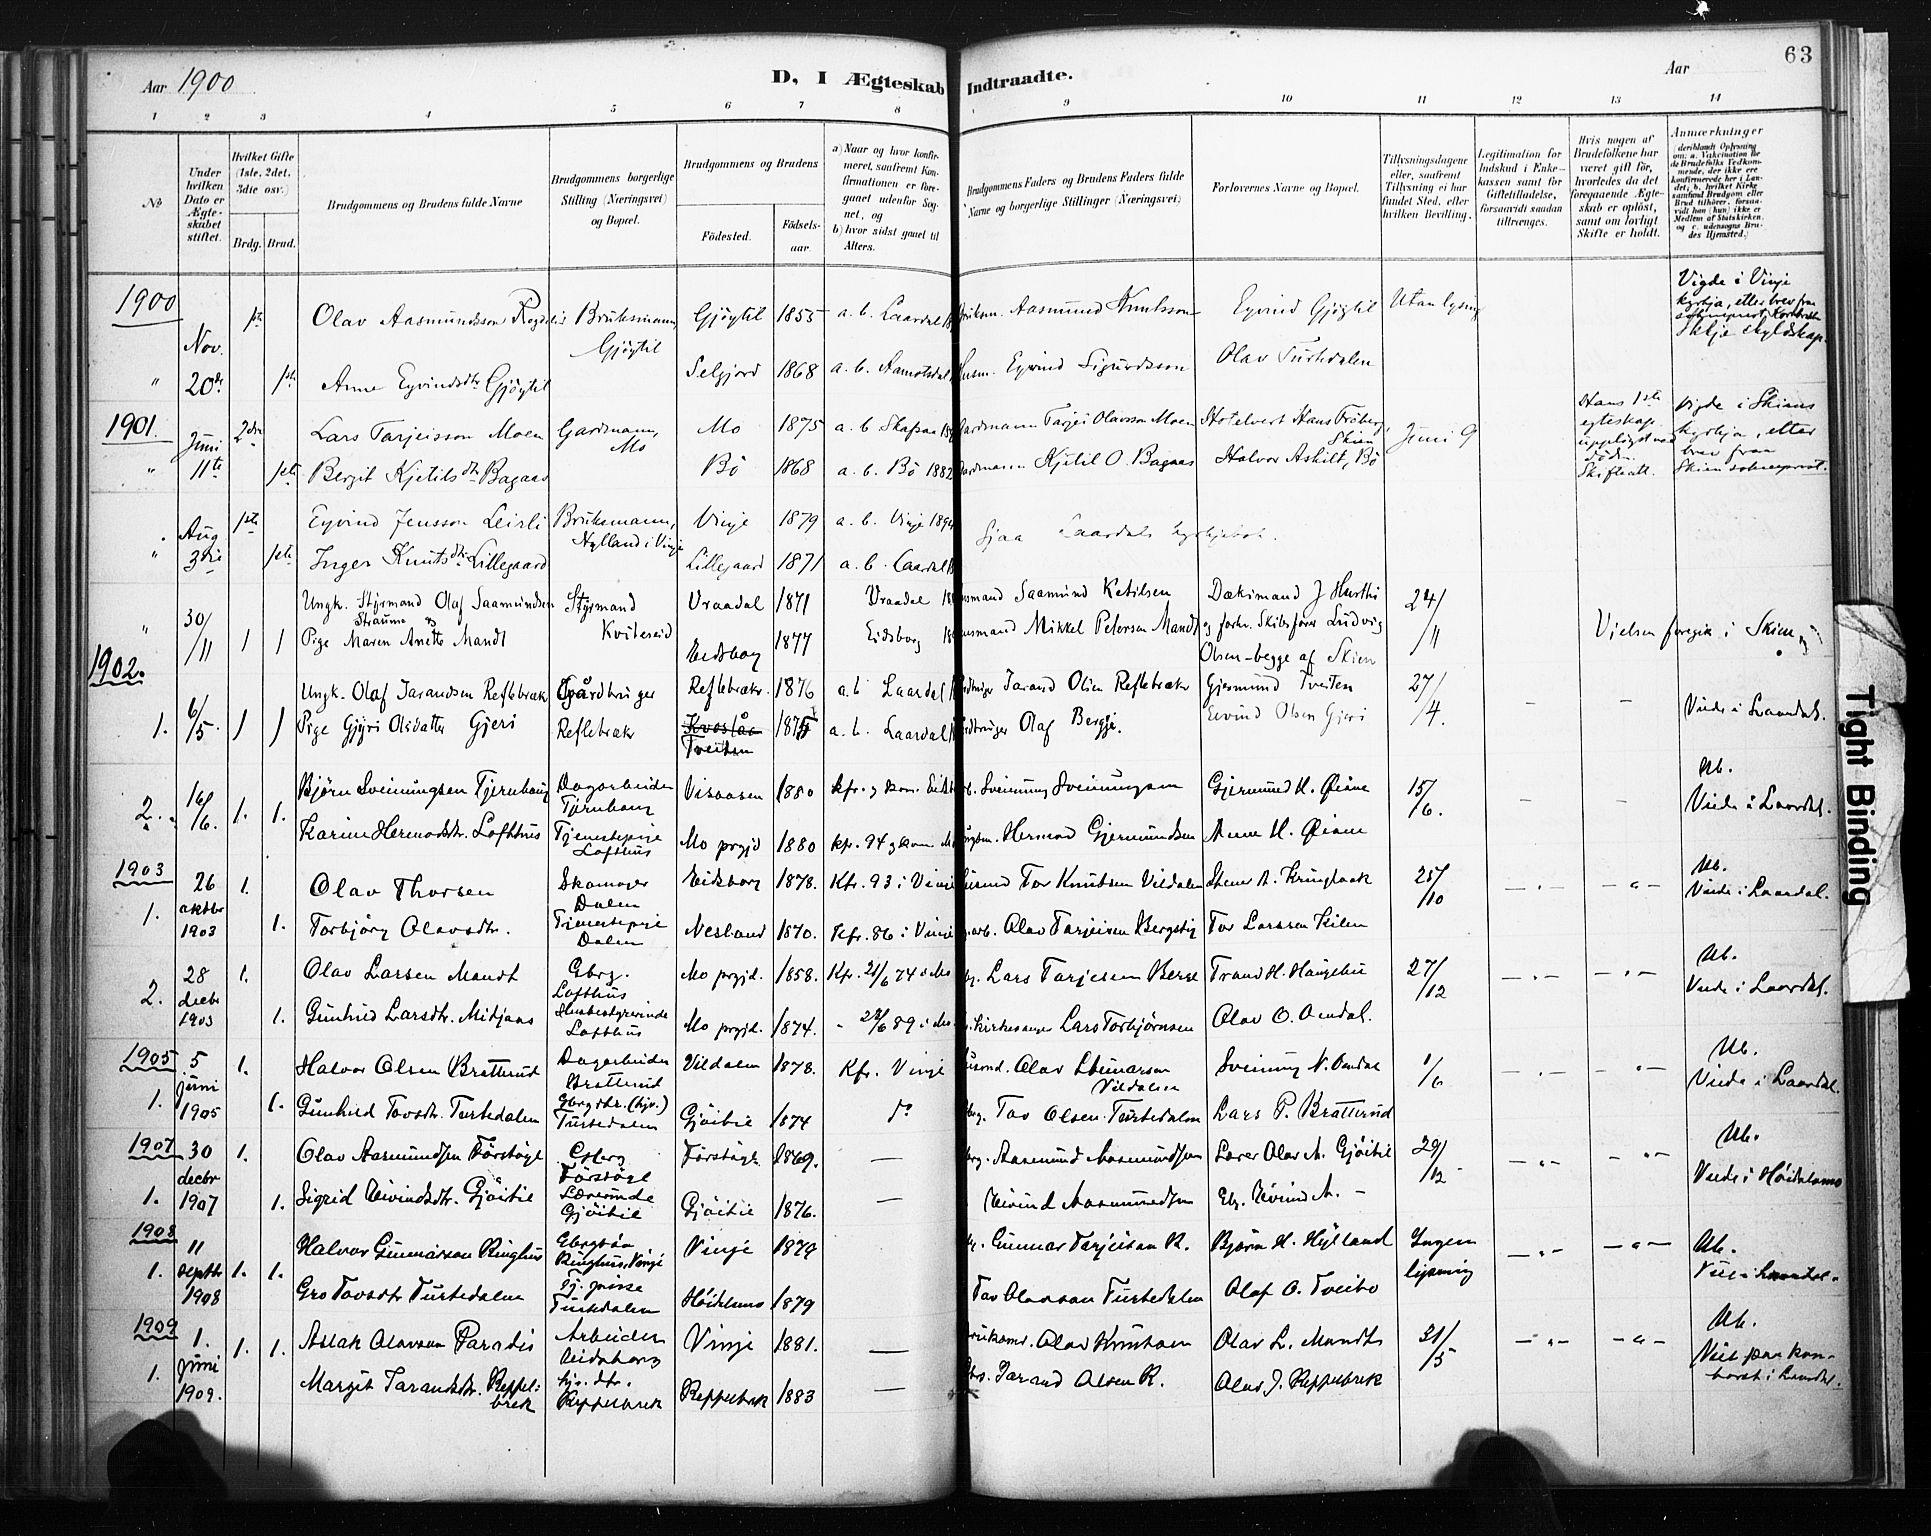 SAKO, Lårdal kirkebøker, F/Fb/L0002: Ministerialbok nr. II 2, 1887-1918, s. 63